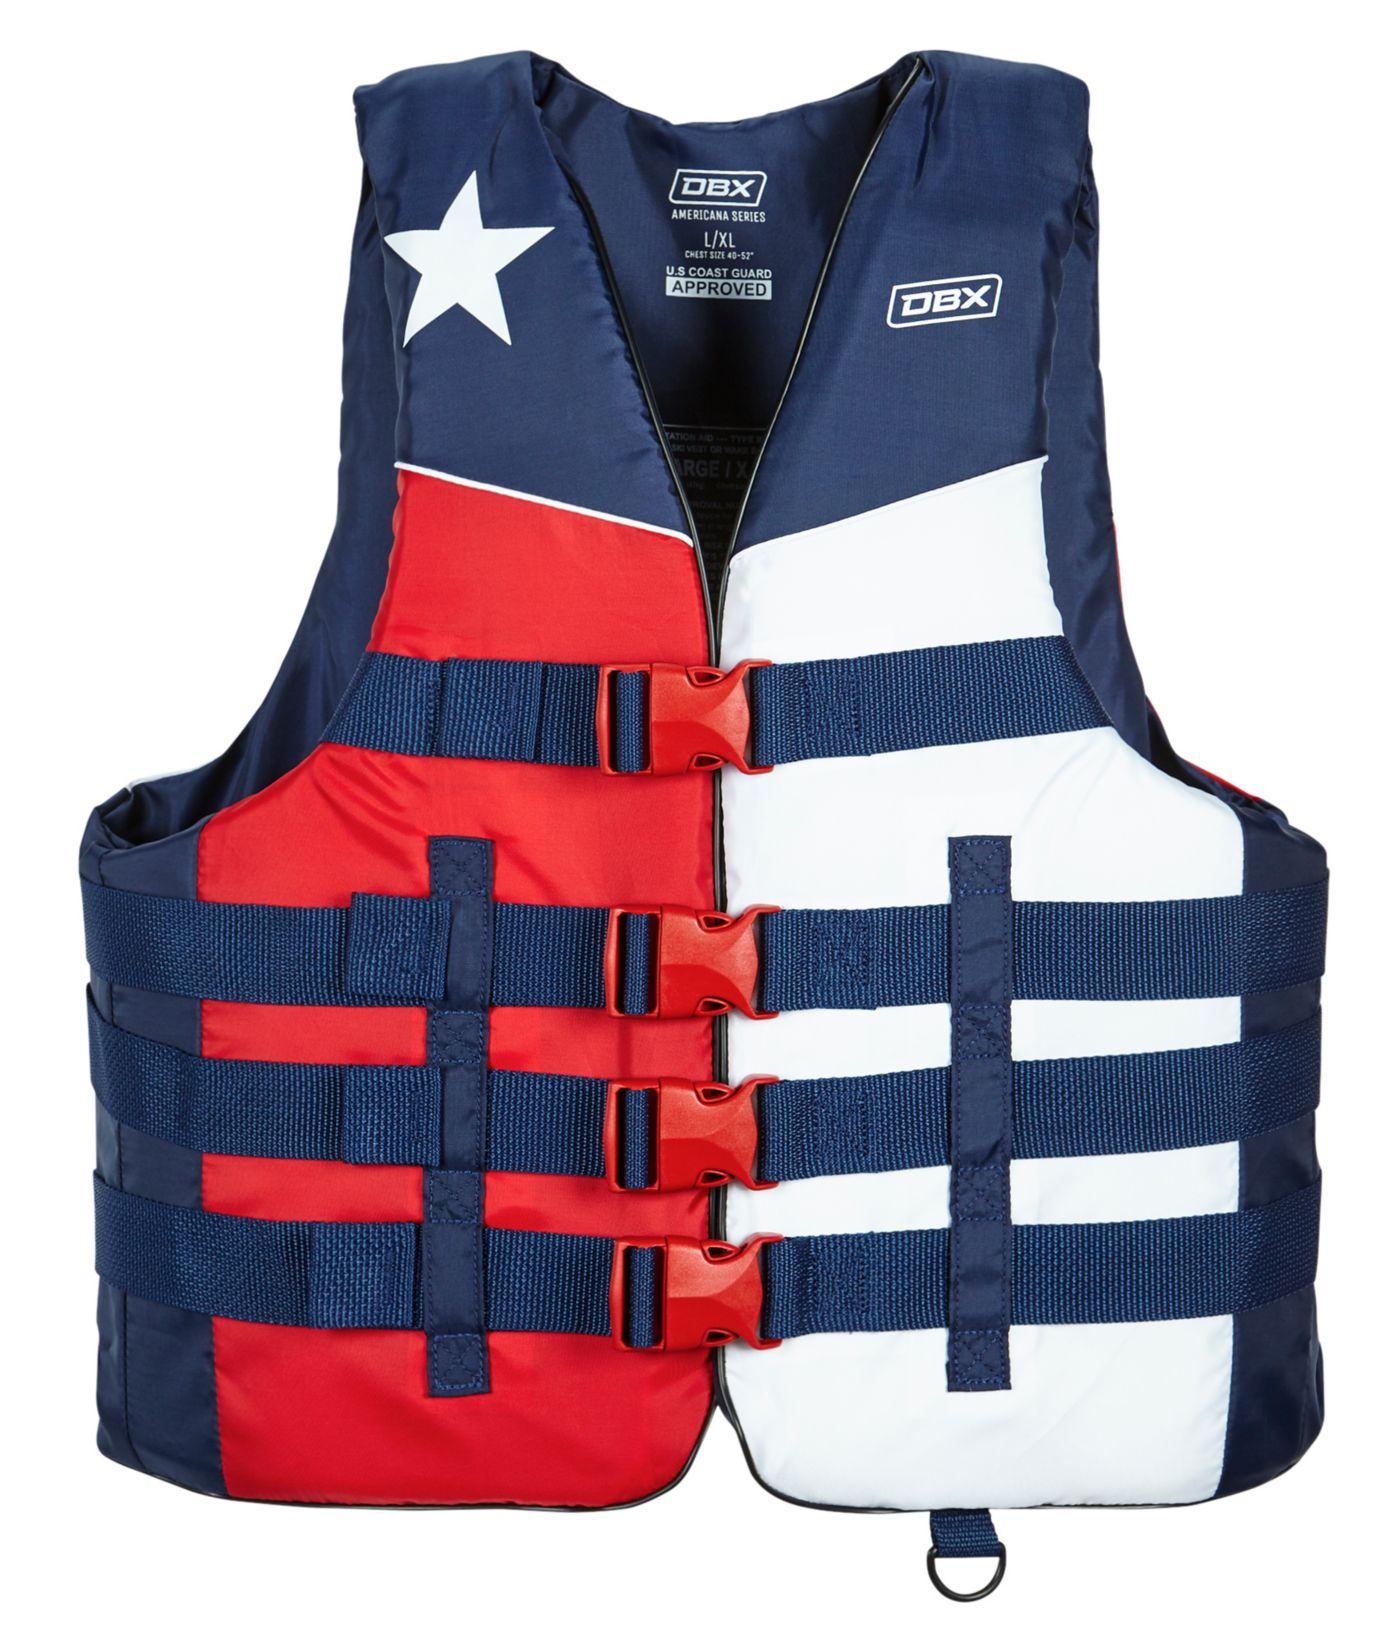 DBX Men's Americana Series Texas Life Vest